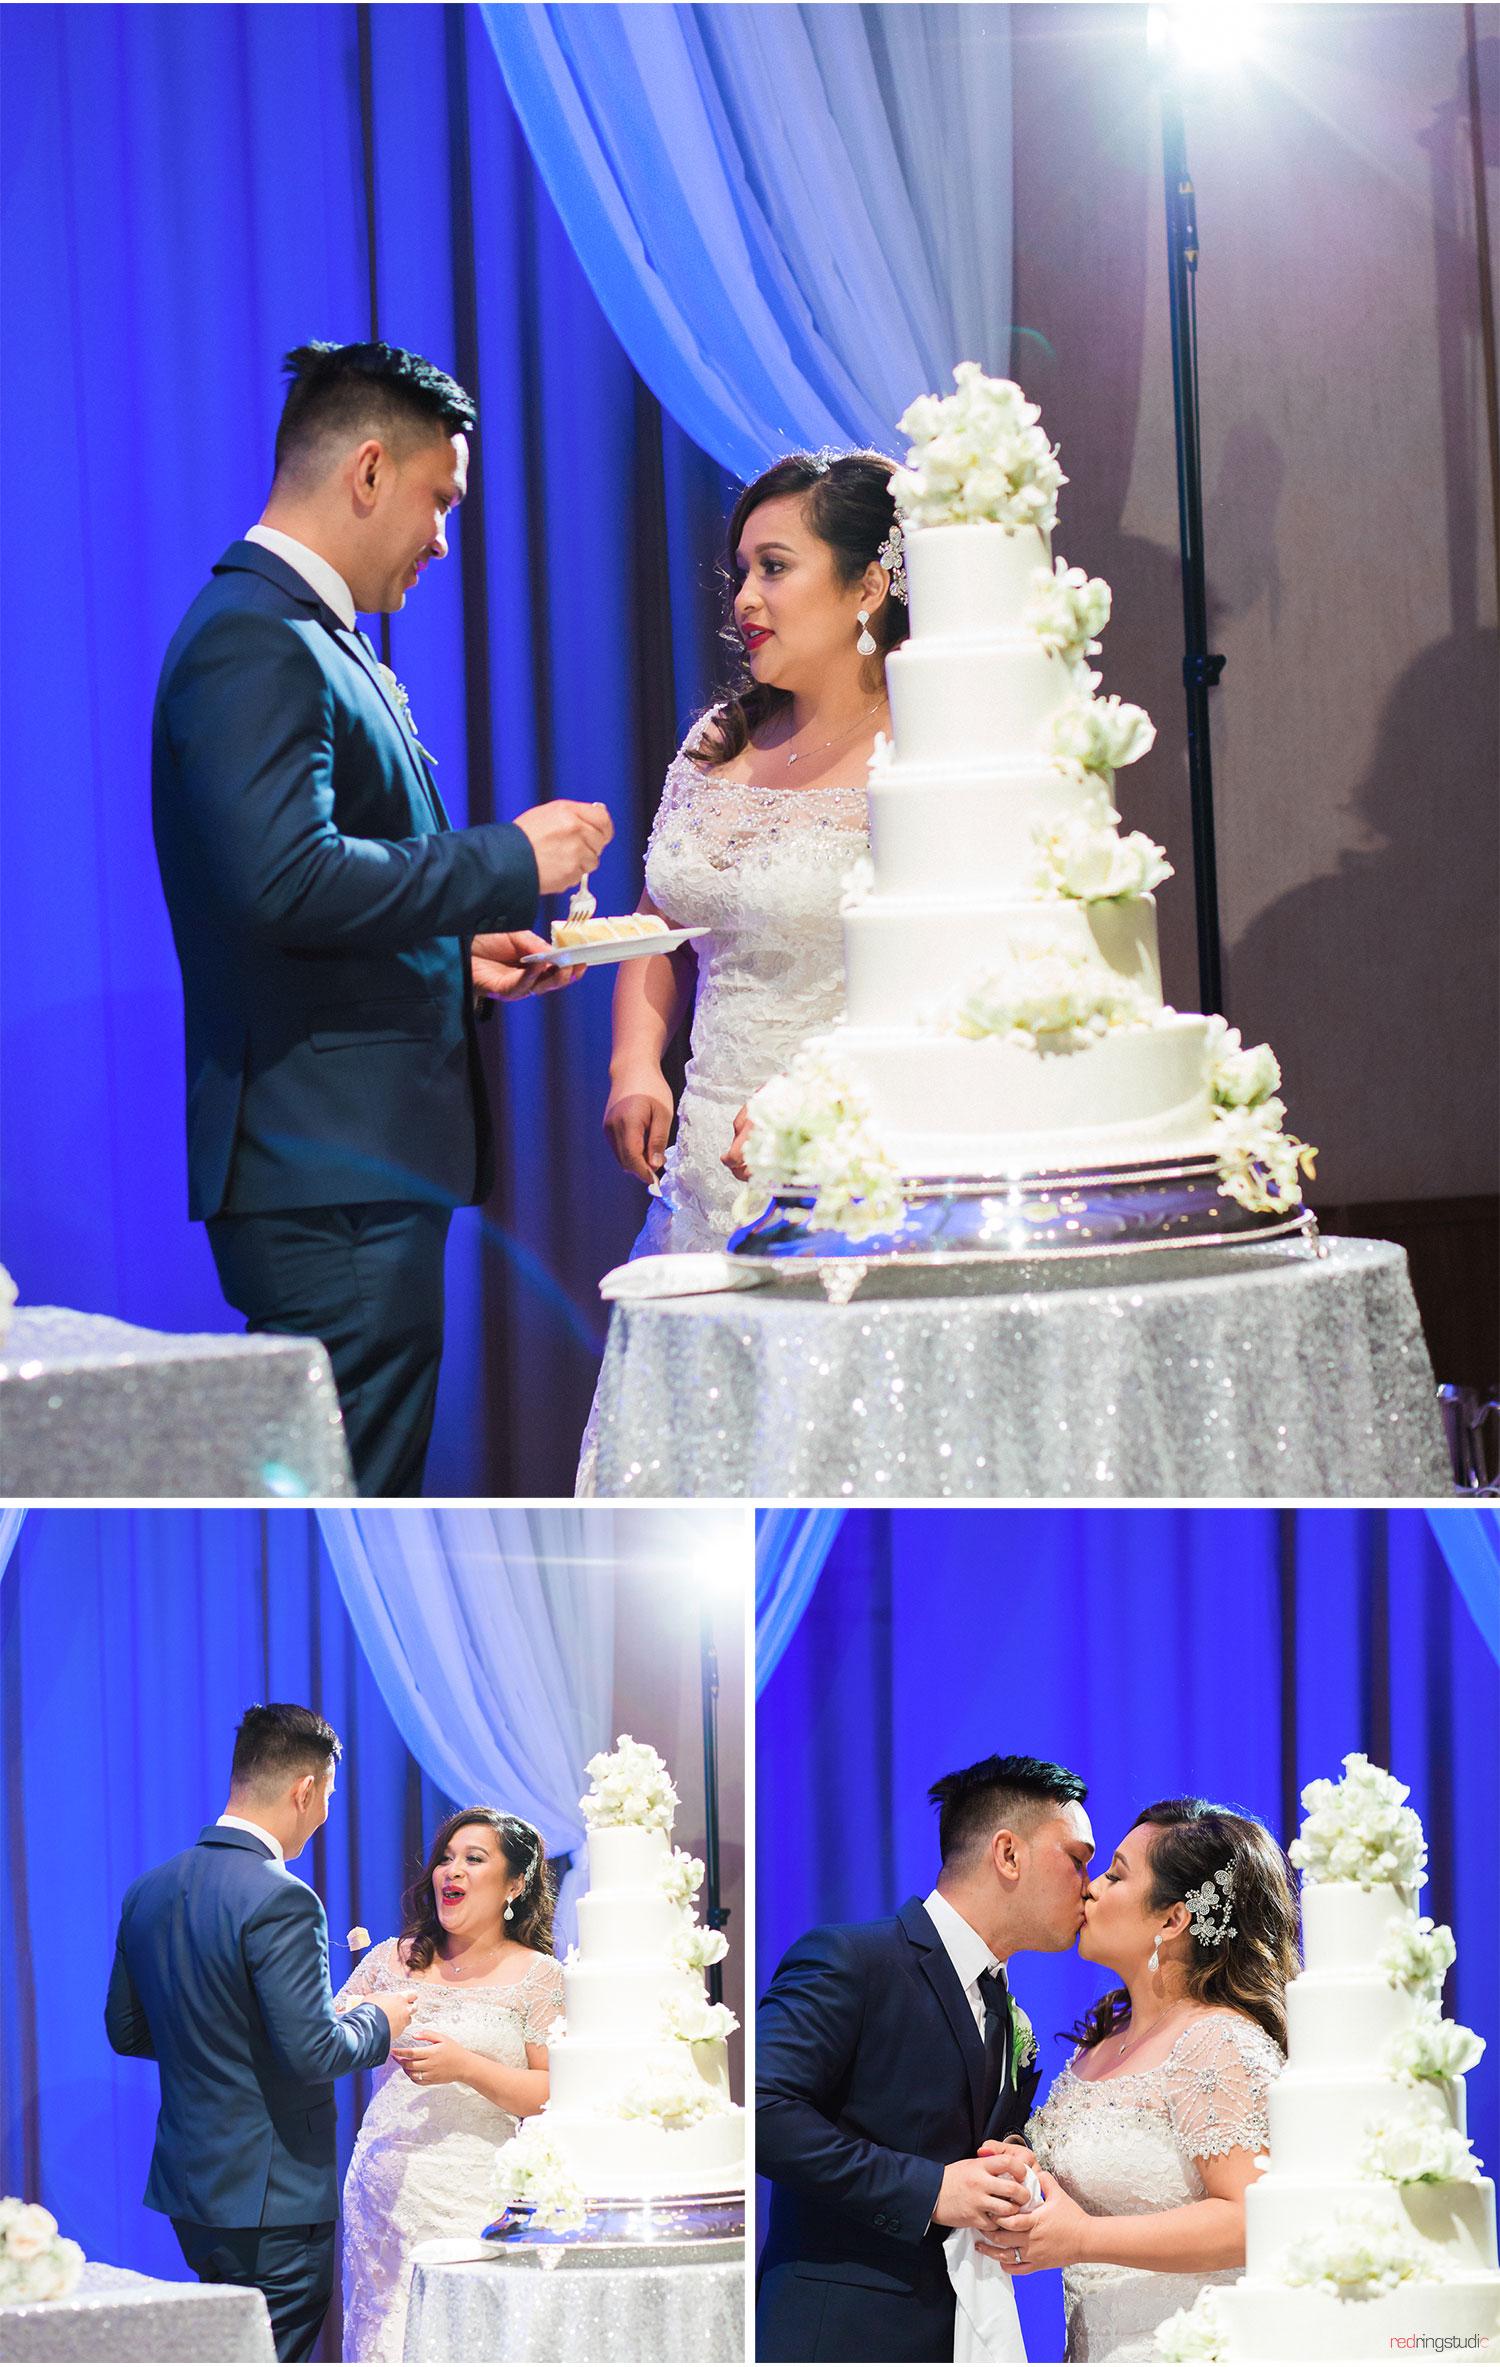 OA_Mimi_+_Lex_44.Reception_cake_cut_Halekulani_Ballroom.jpg